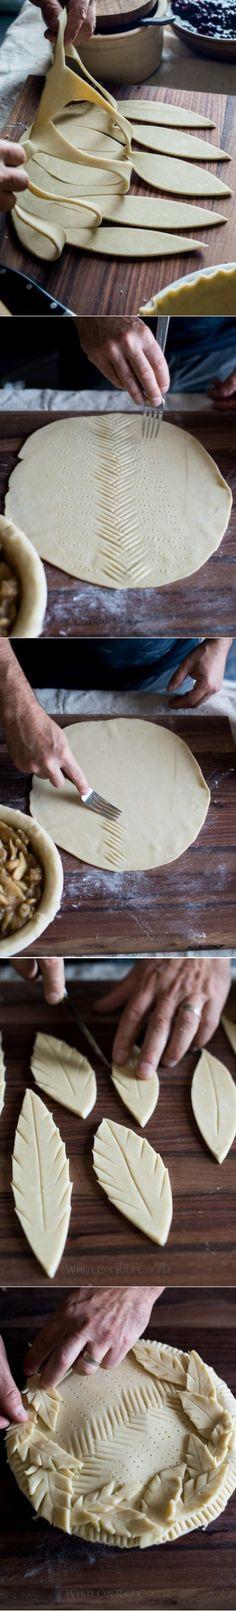 Decoration of pies